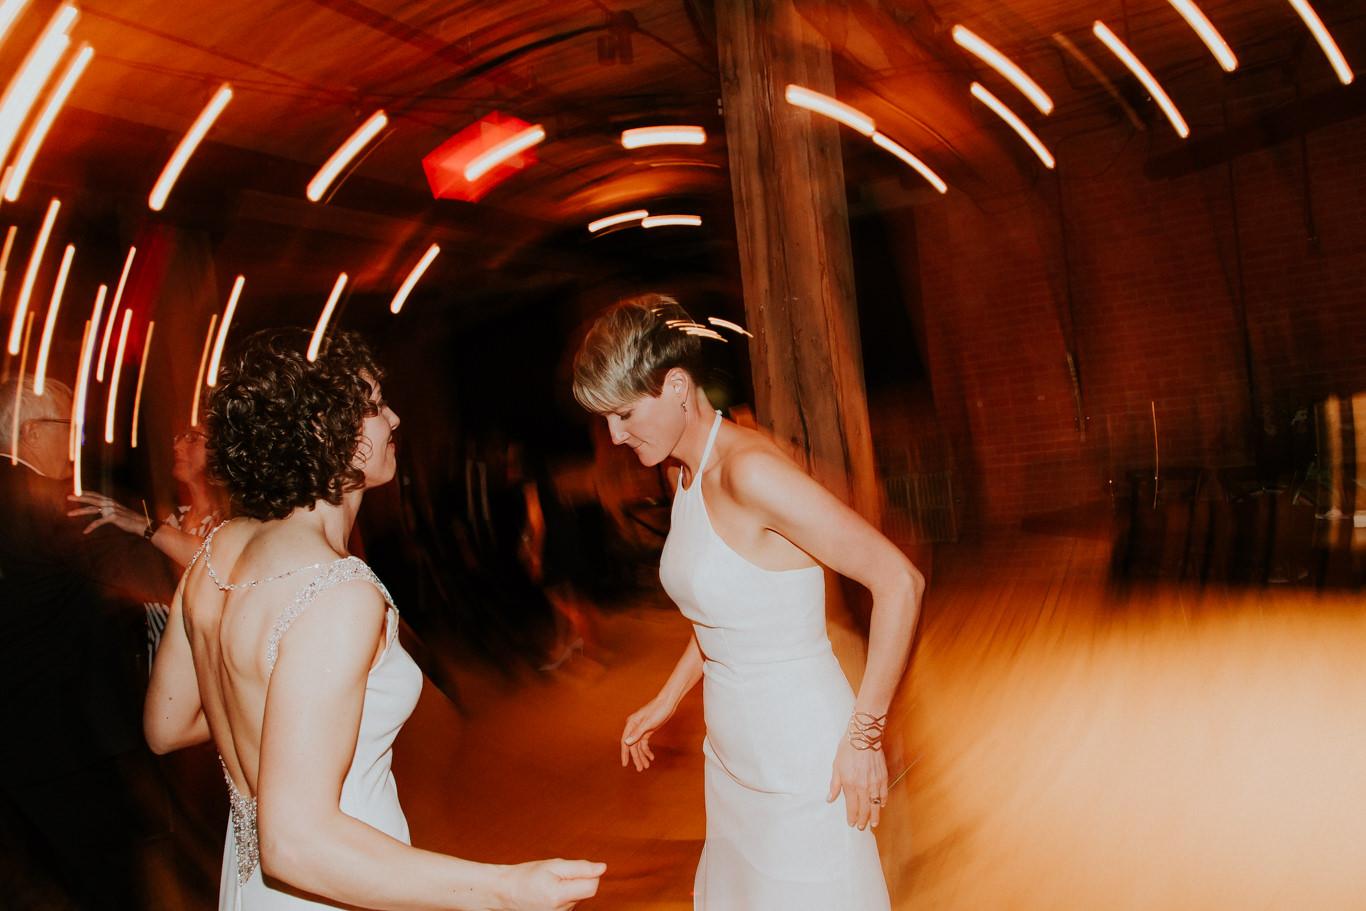 Lindsay-and-Heather-Charbar-Restaurant-Wedding-in-Calgary-229